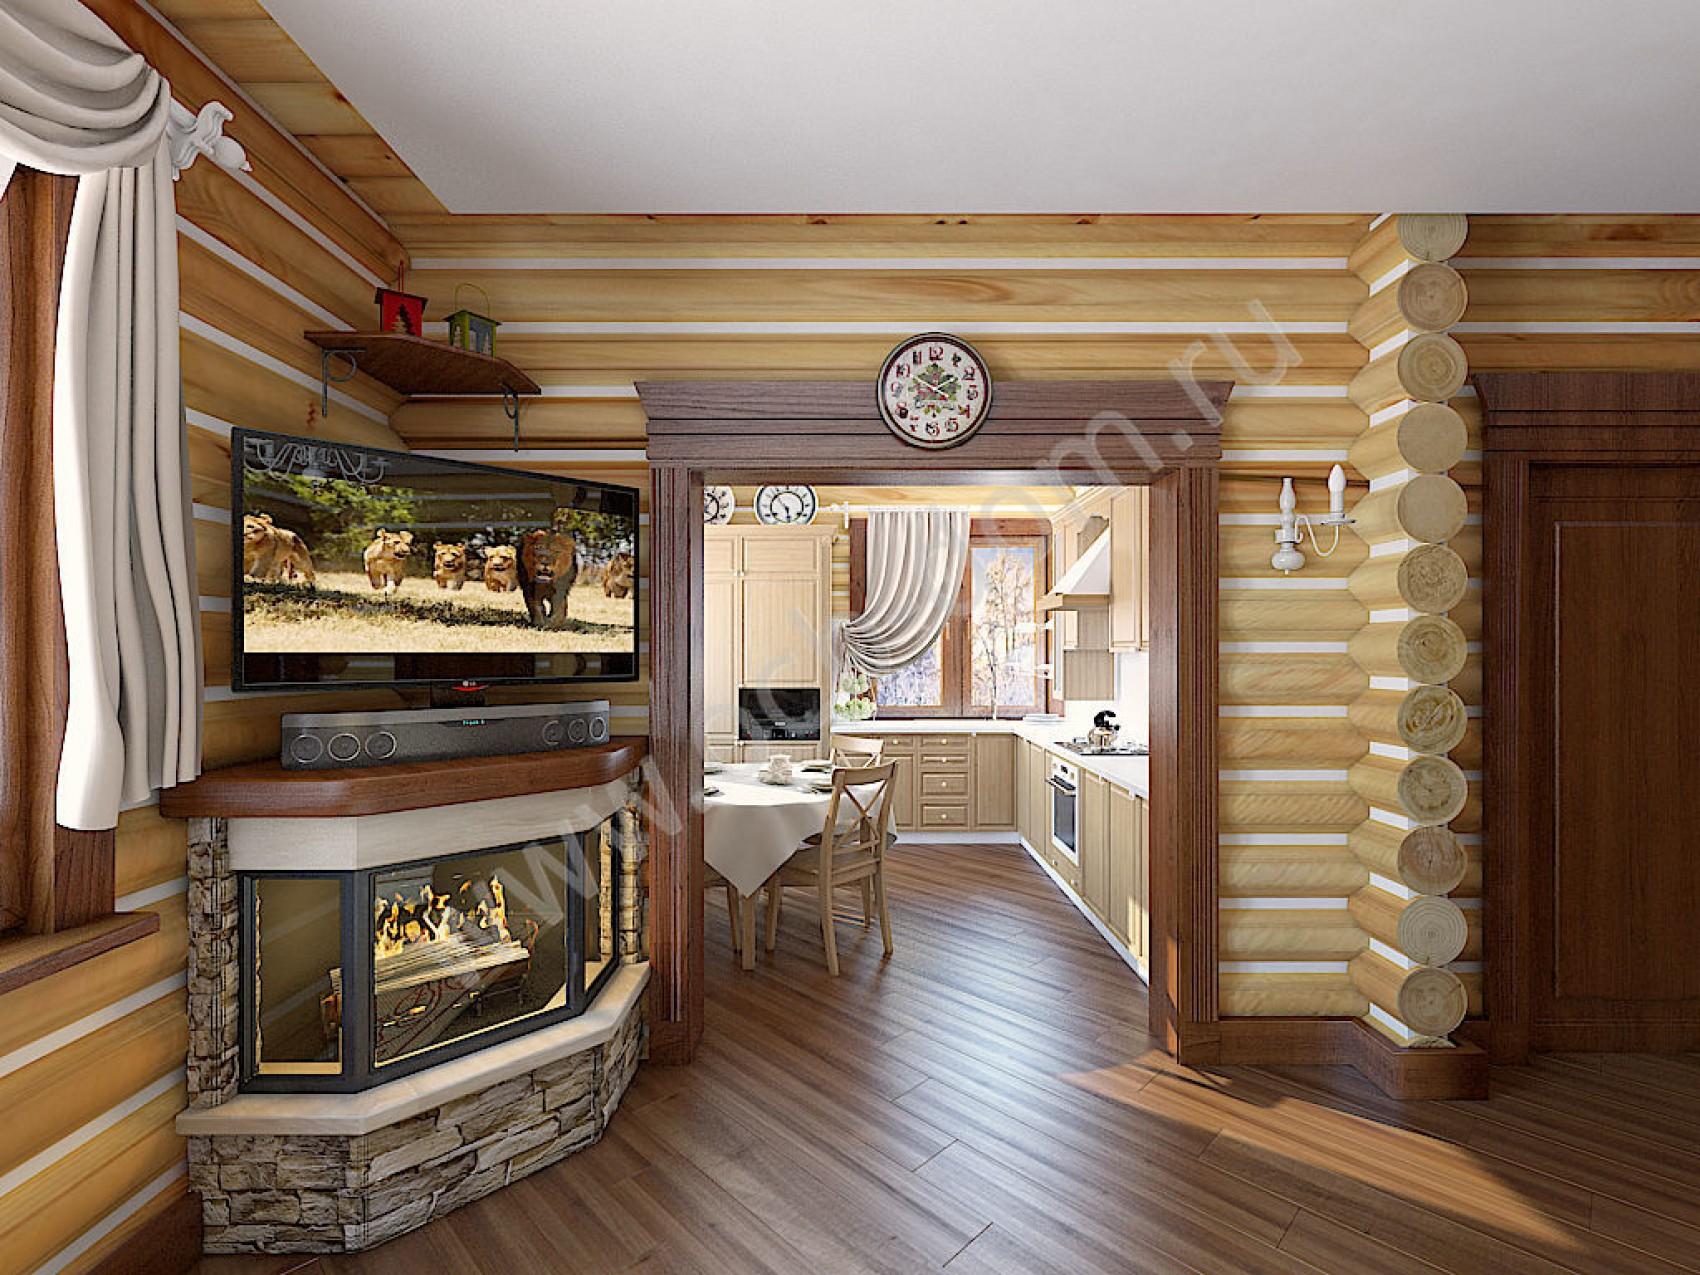 Фото домов из оцилиндрованного бревна внутри 135